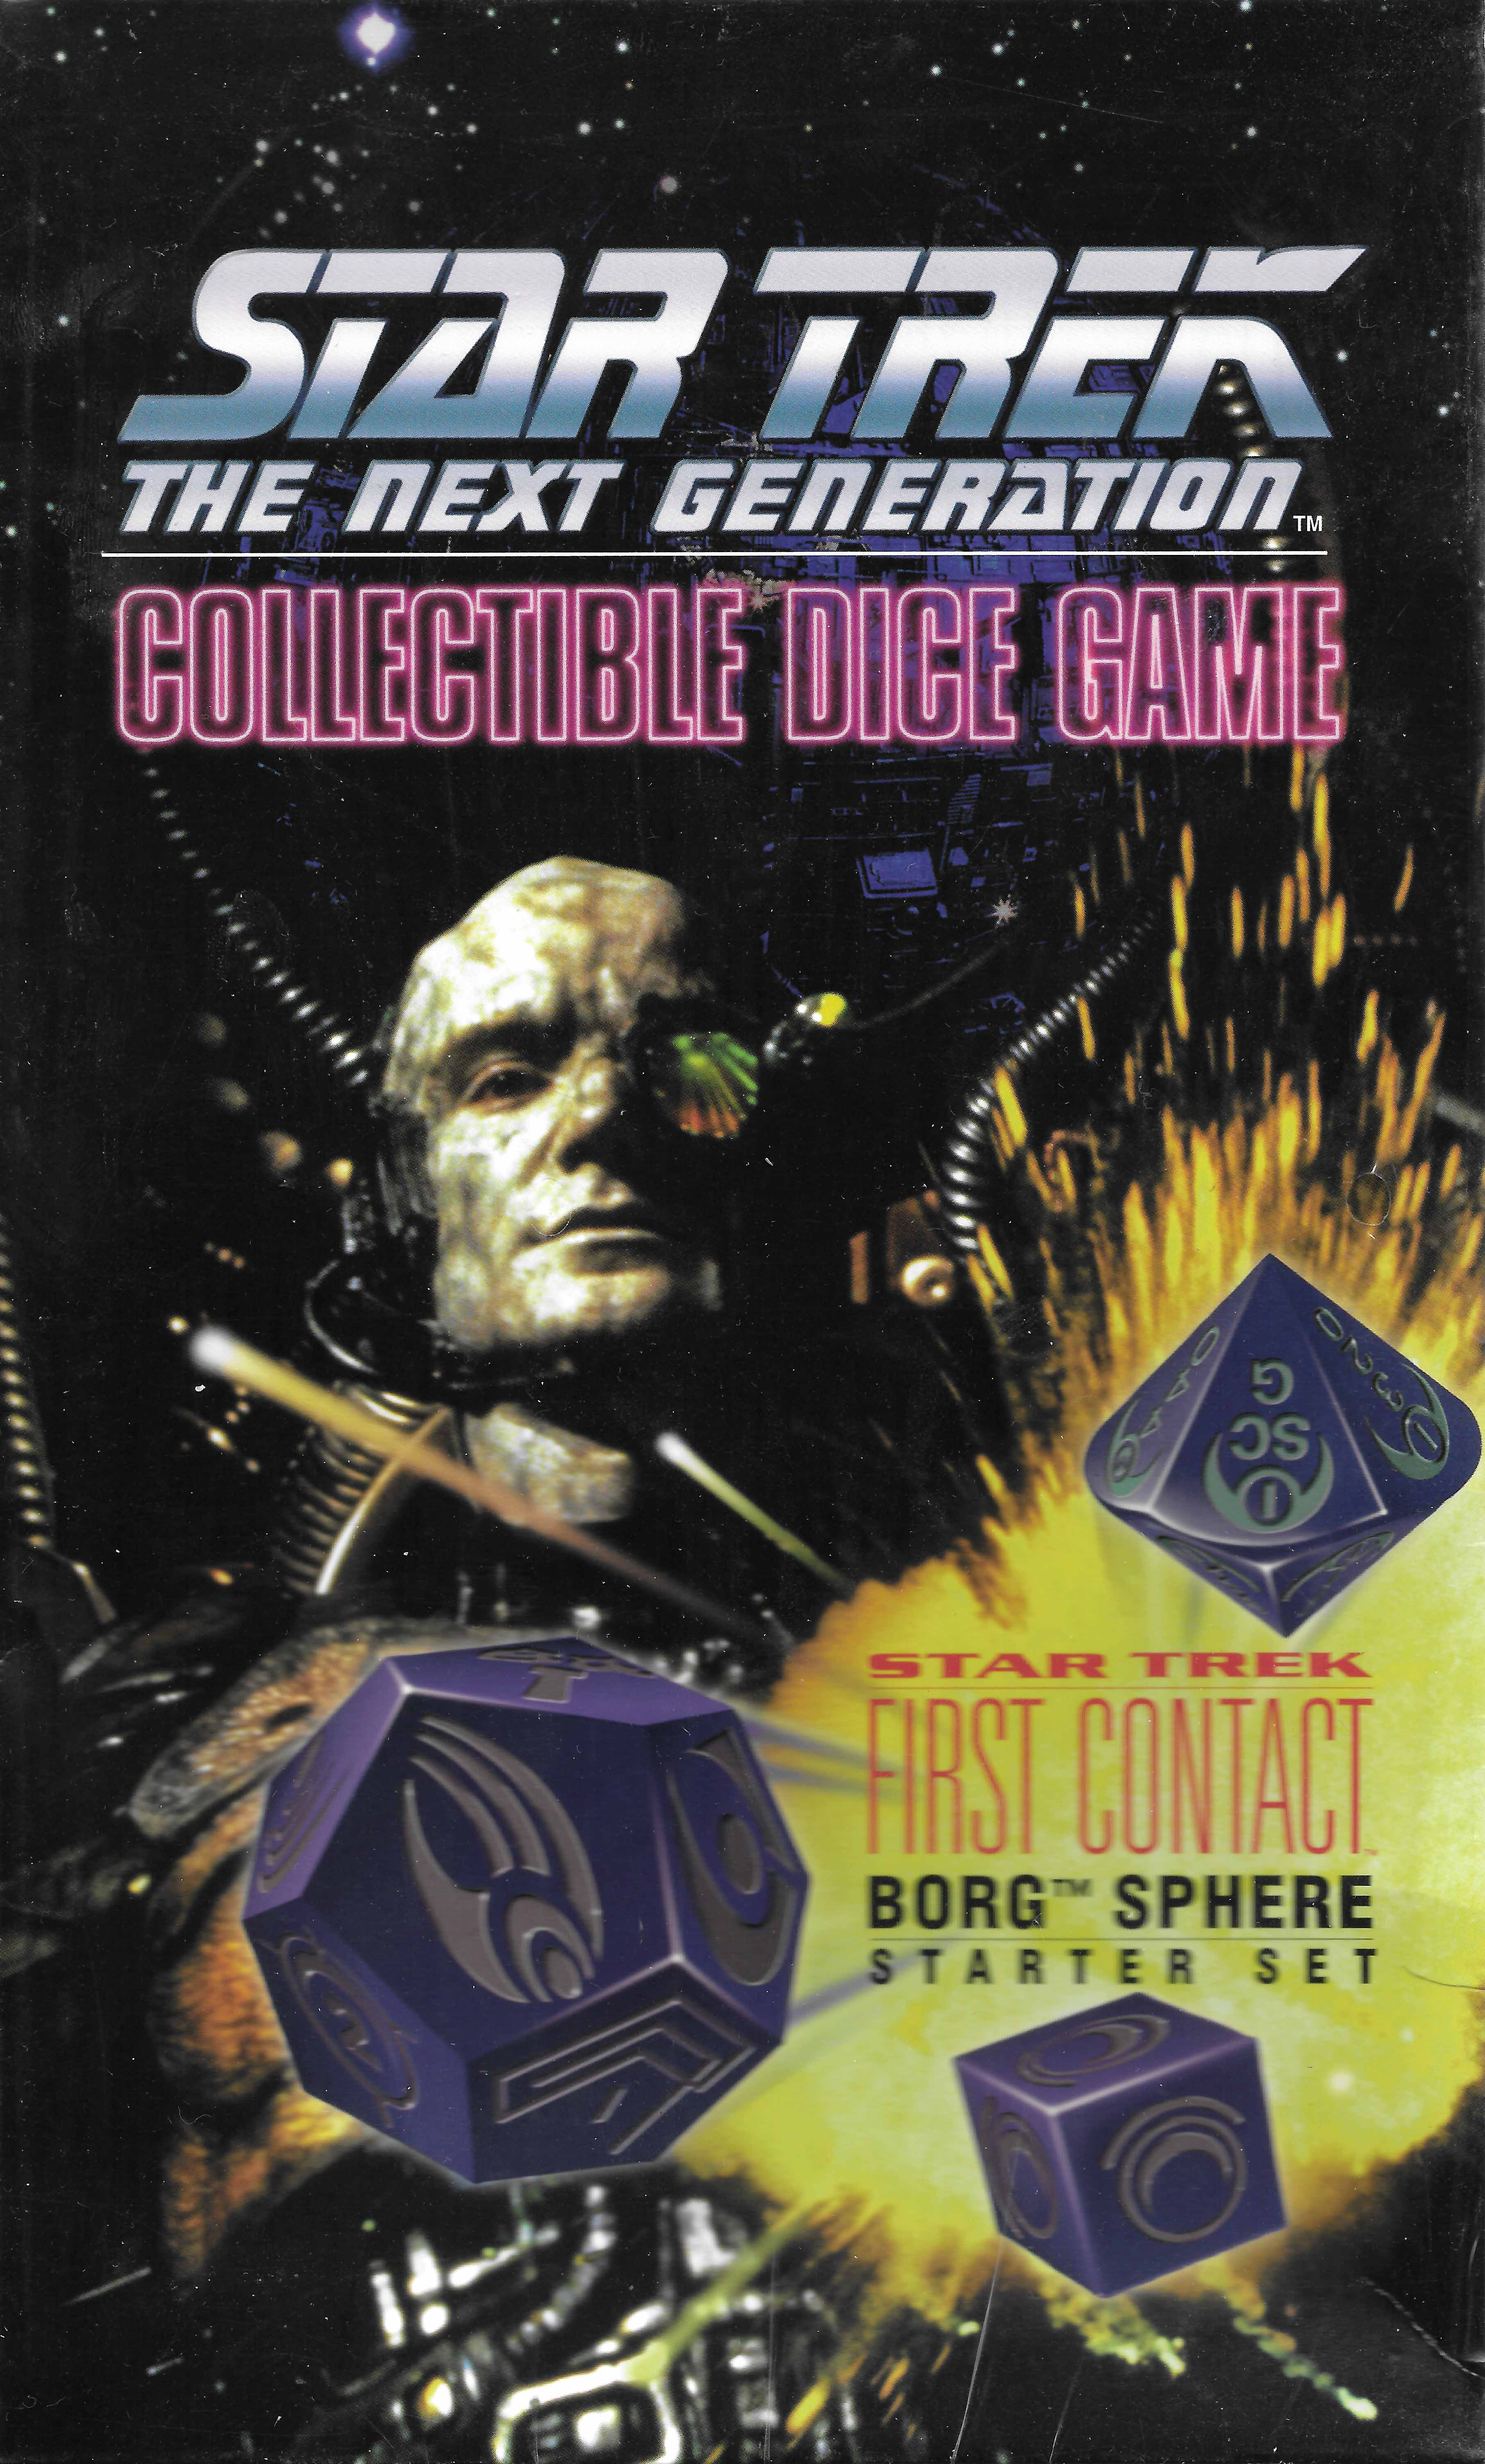 Star Trek Collectible Dice Game: Borg Sphere Starter